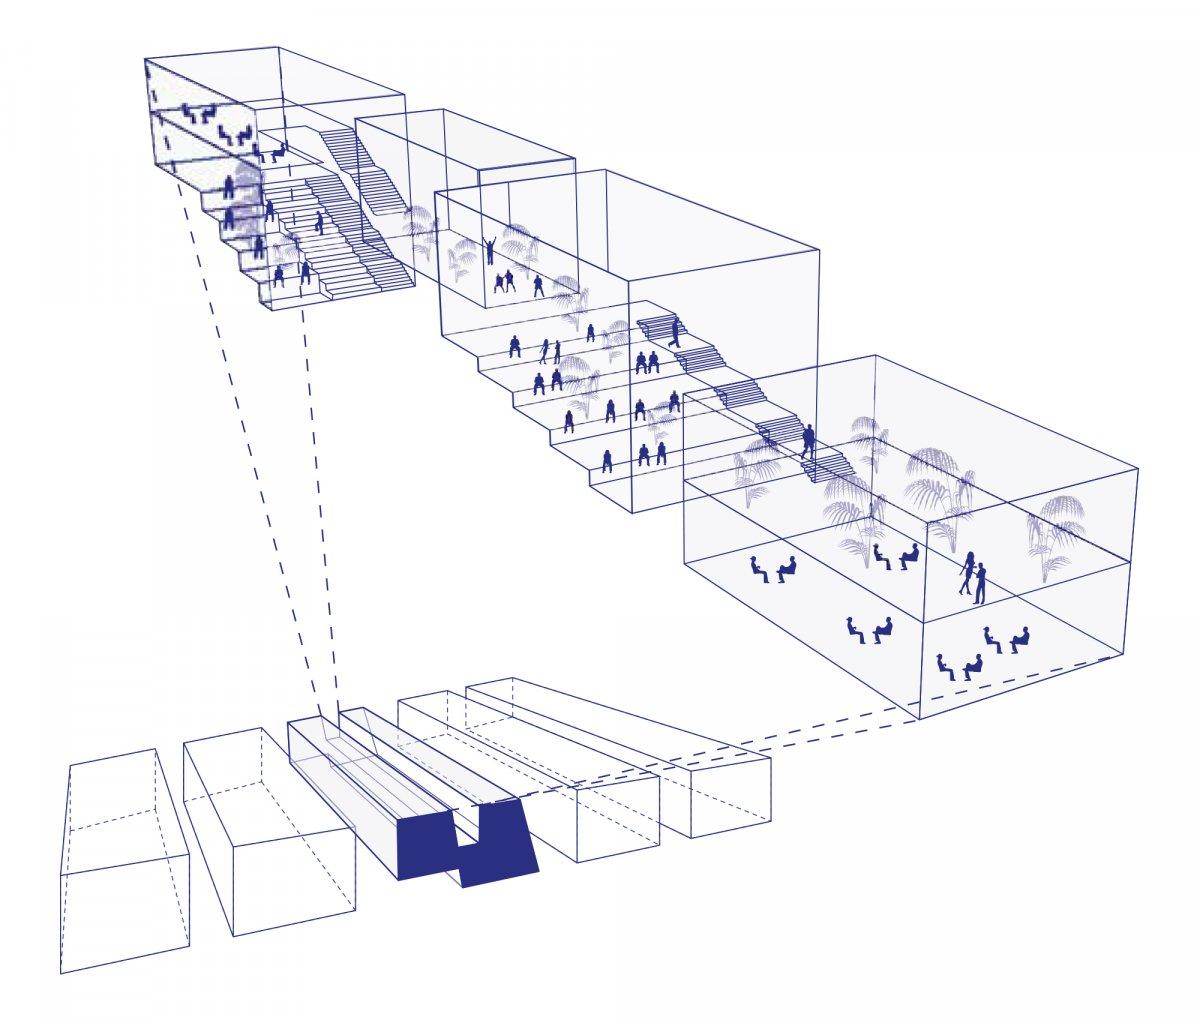 Diagram-common areas